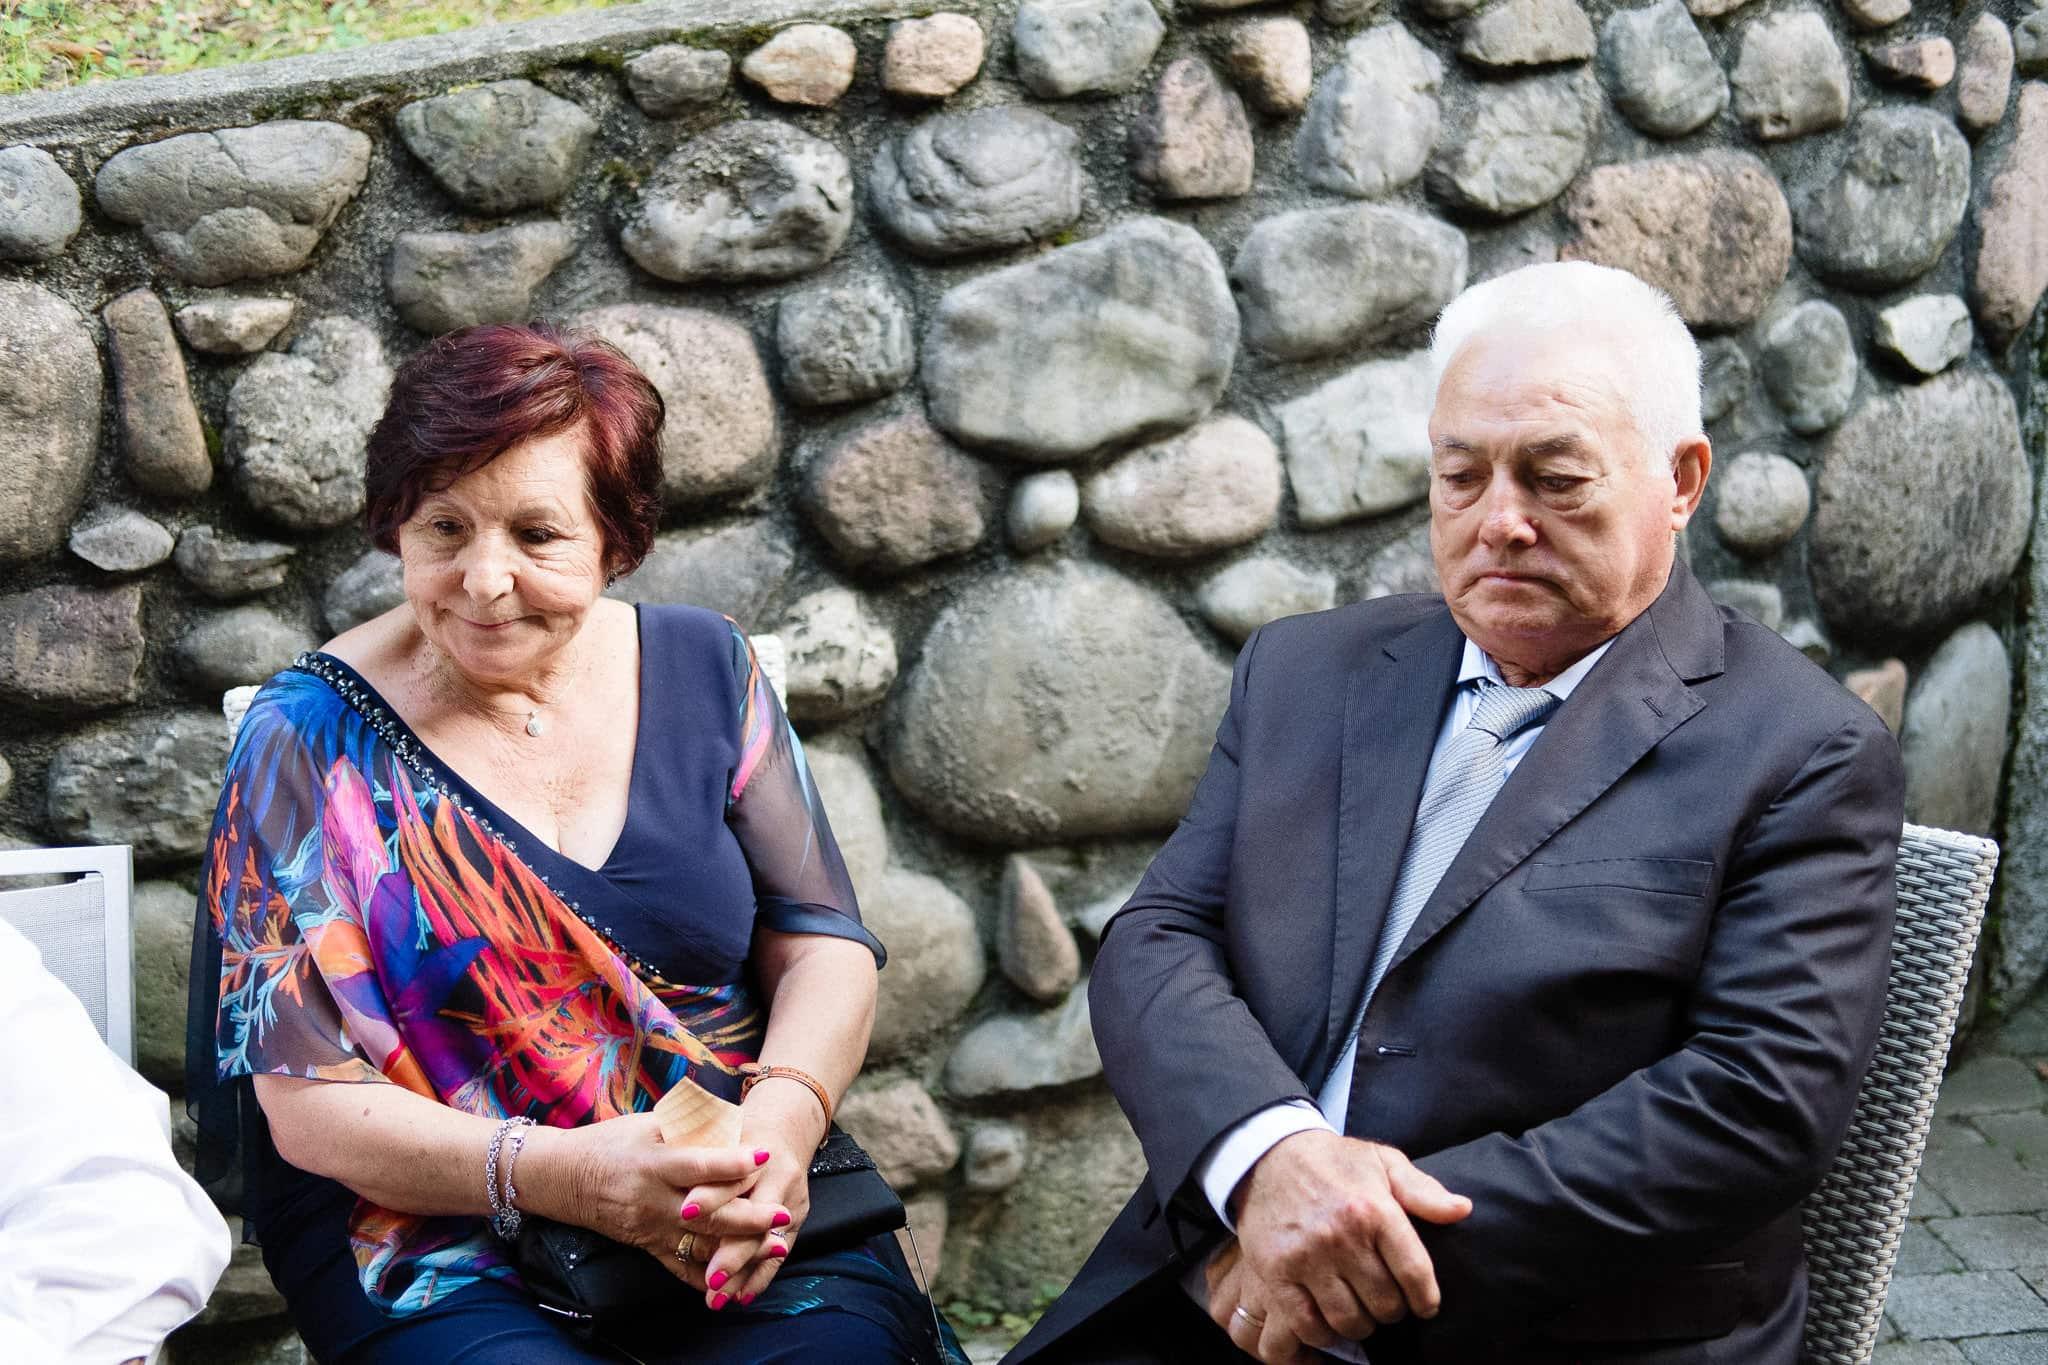 fotografo matrimonio cascina diodona varese lucarossifoto 00047